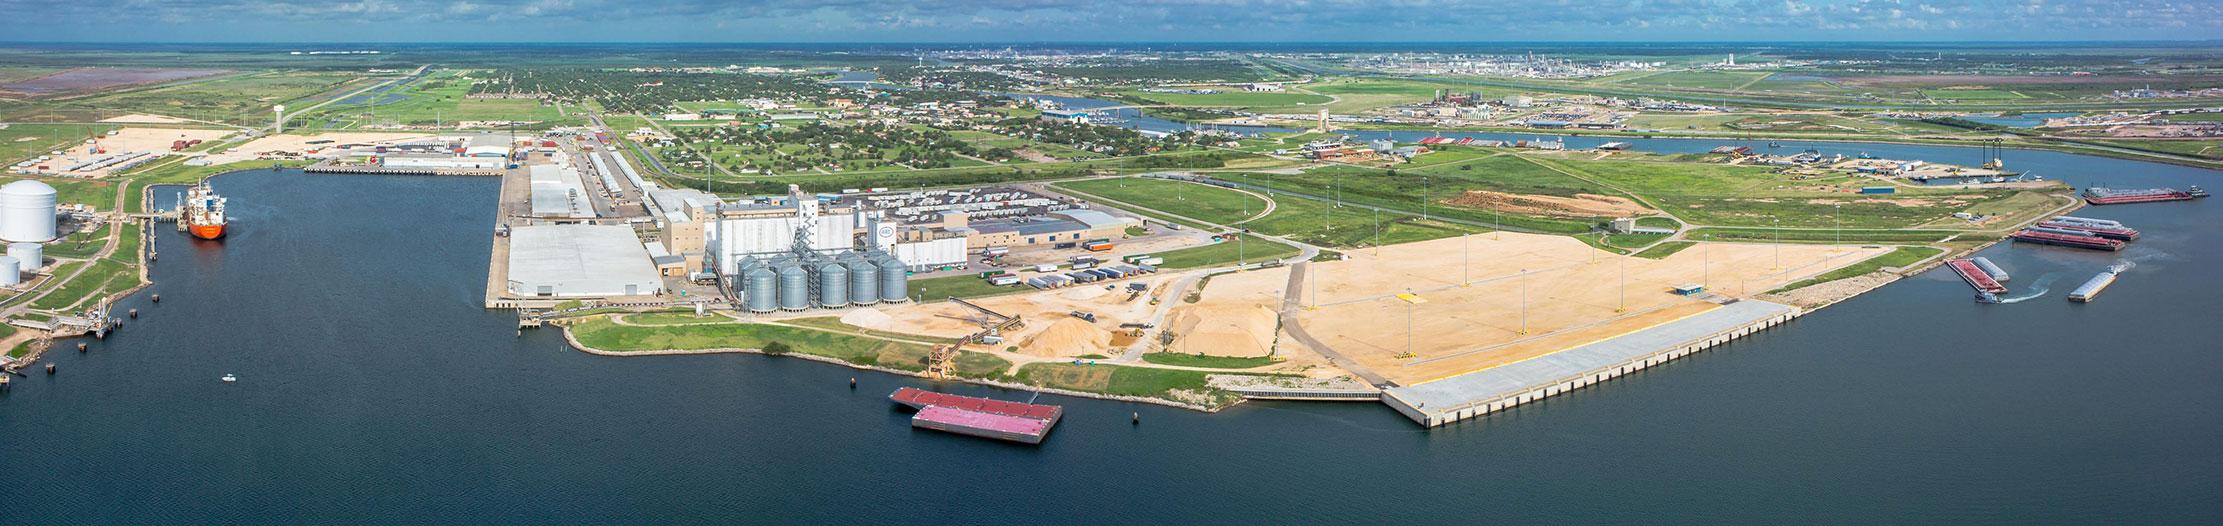 port freeport waterways